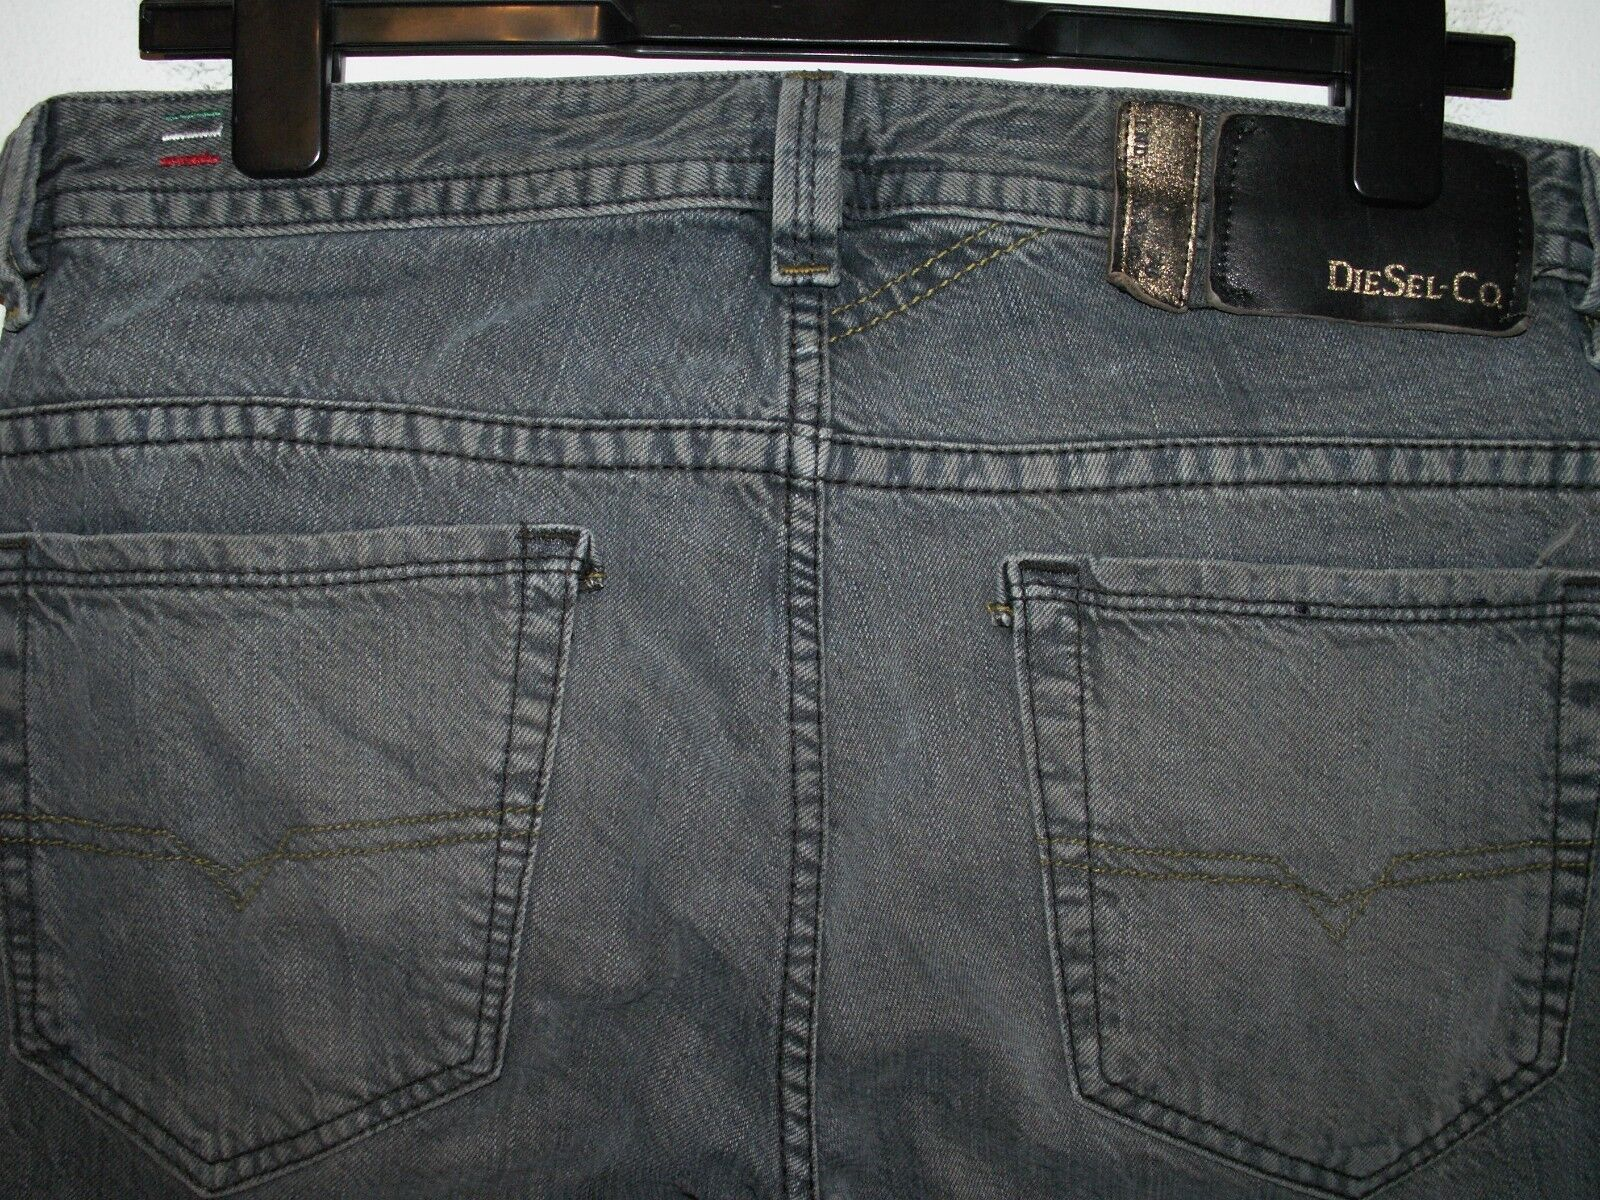 Diesel thavar slim-skinny fit jeans wash 0807C W30(32) L30 a4225